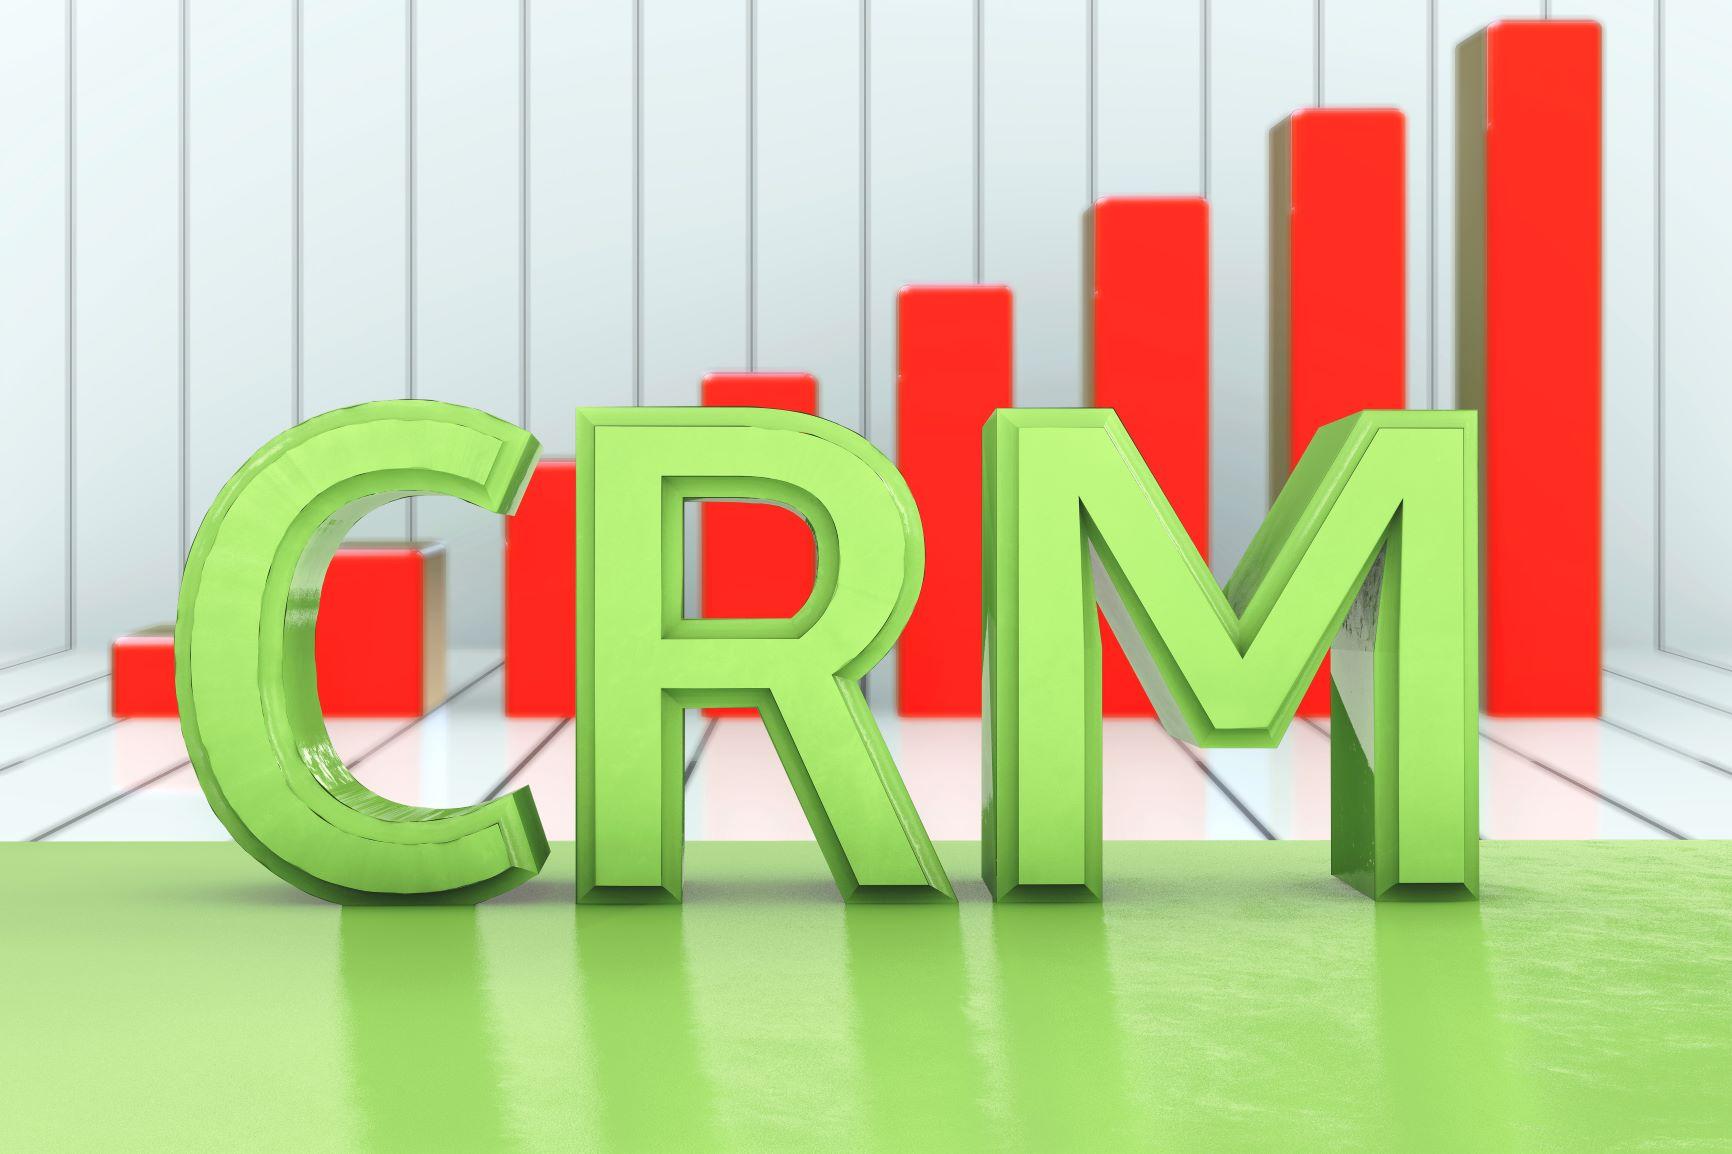 Explaining CRM software